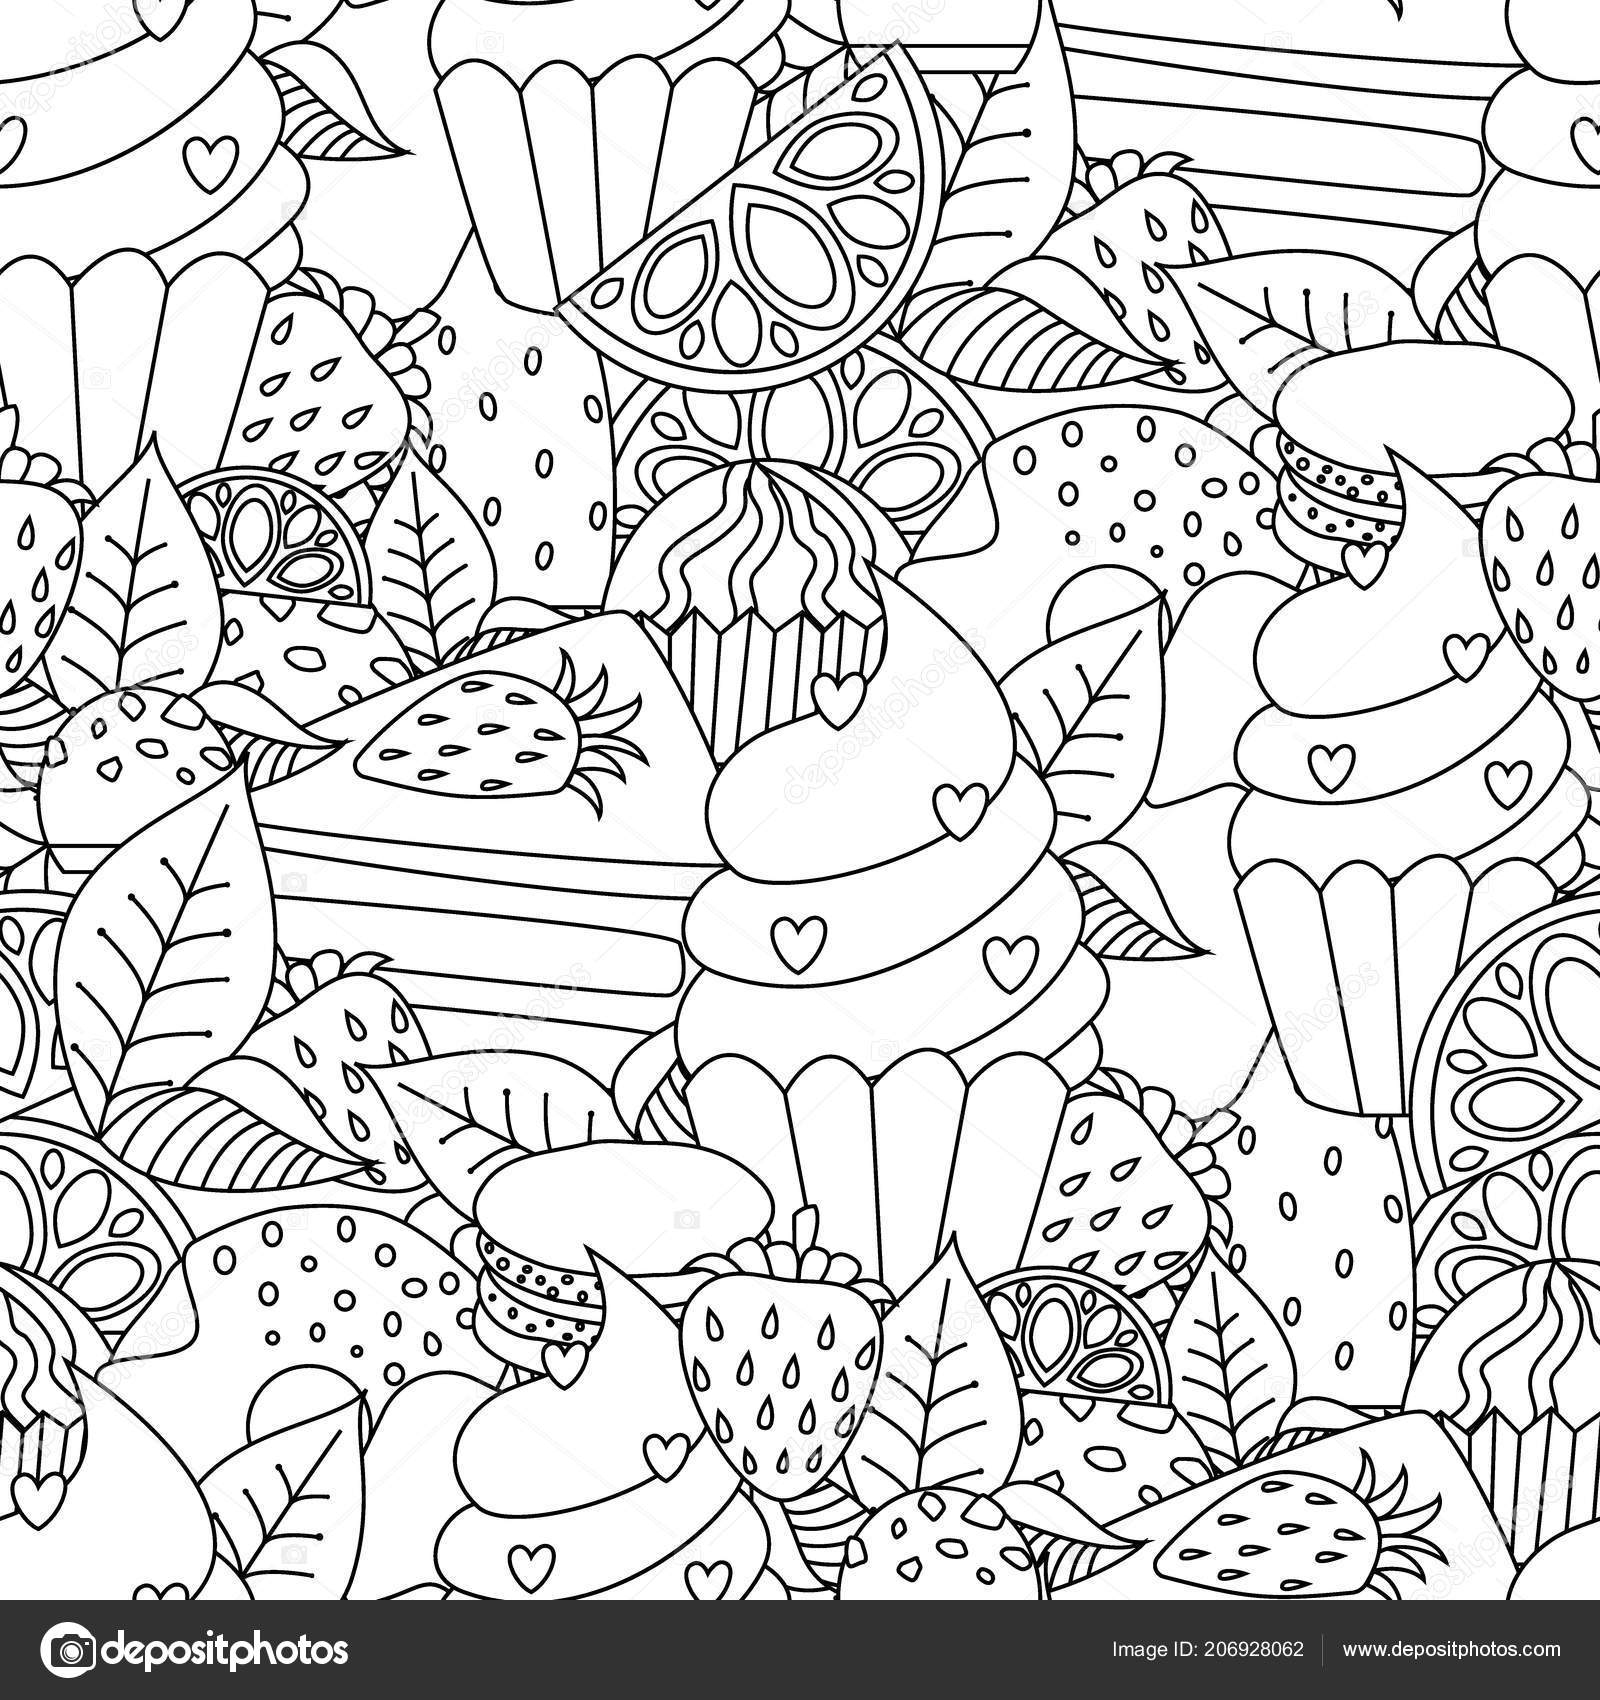 Coloriage Anti Stress Maternelle.Coloriage Livre Dessines Main Esquisse Oeuvre Page Illustration